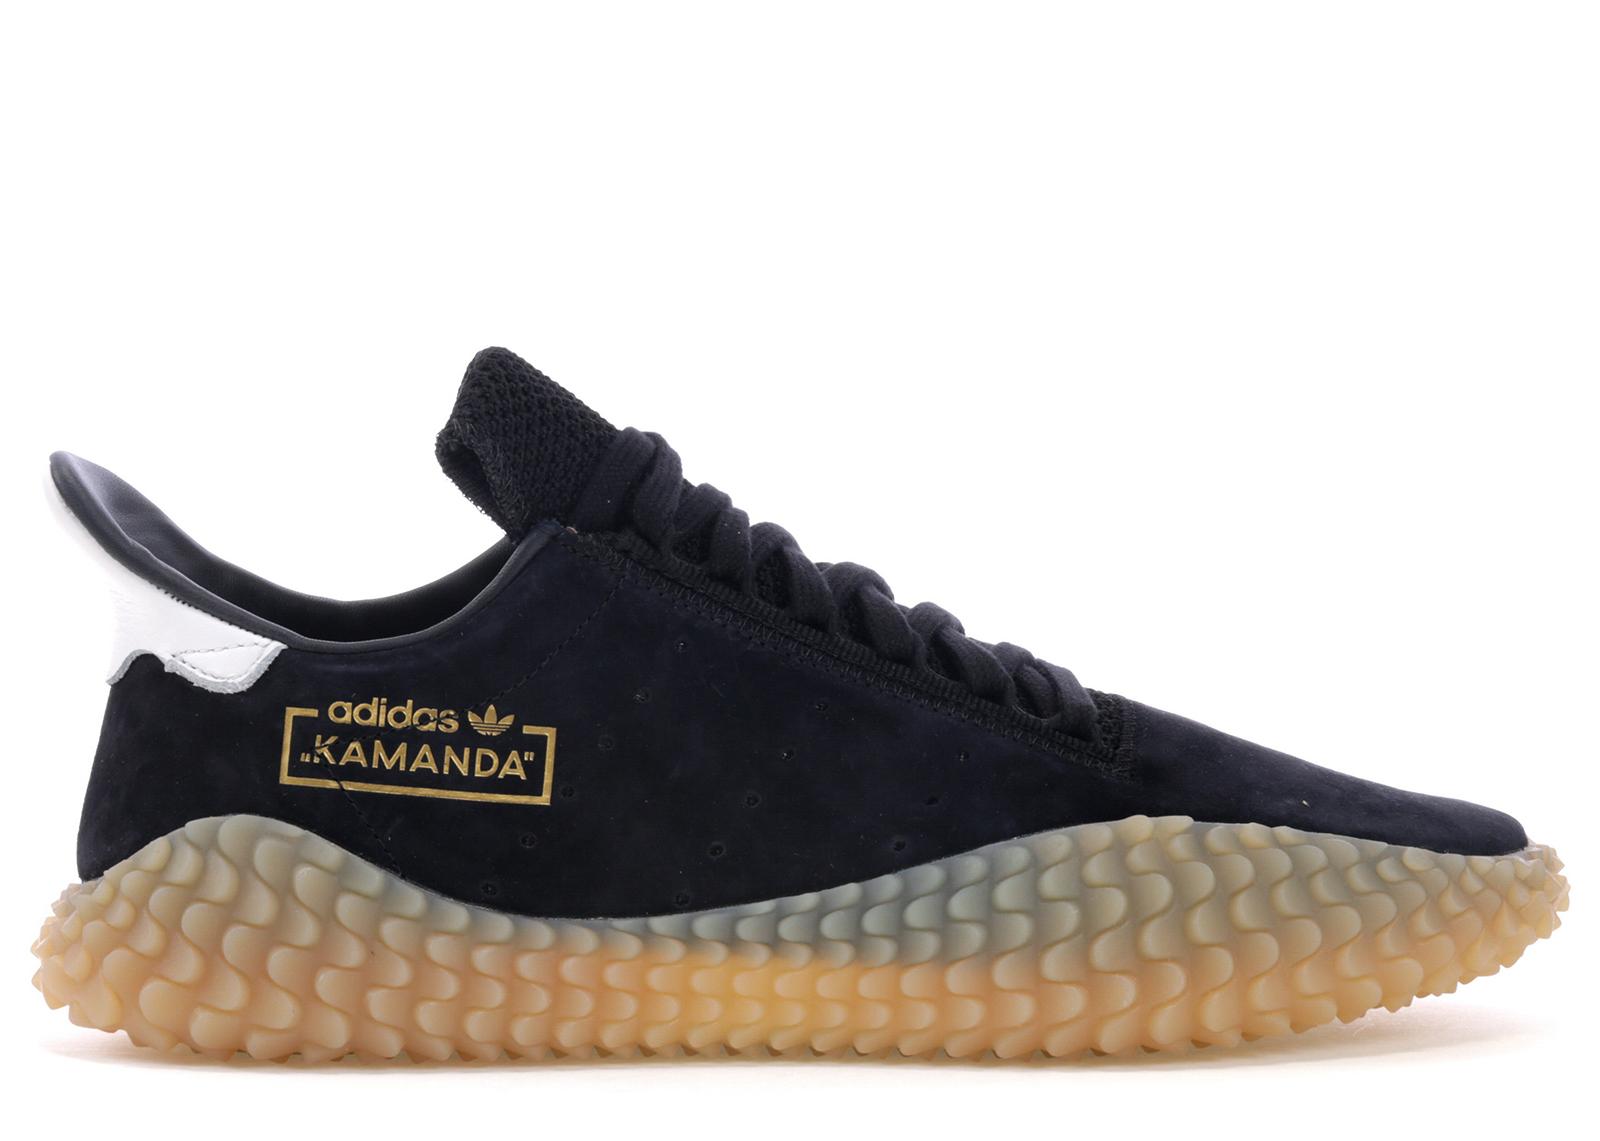 adidas Kamanda Black Gum - CQ2220